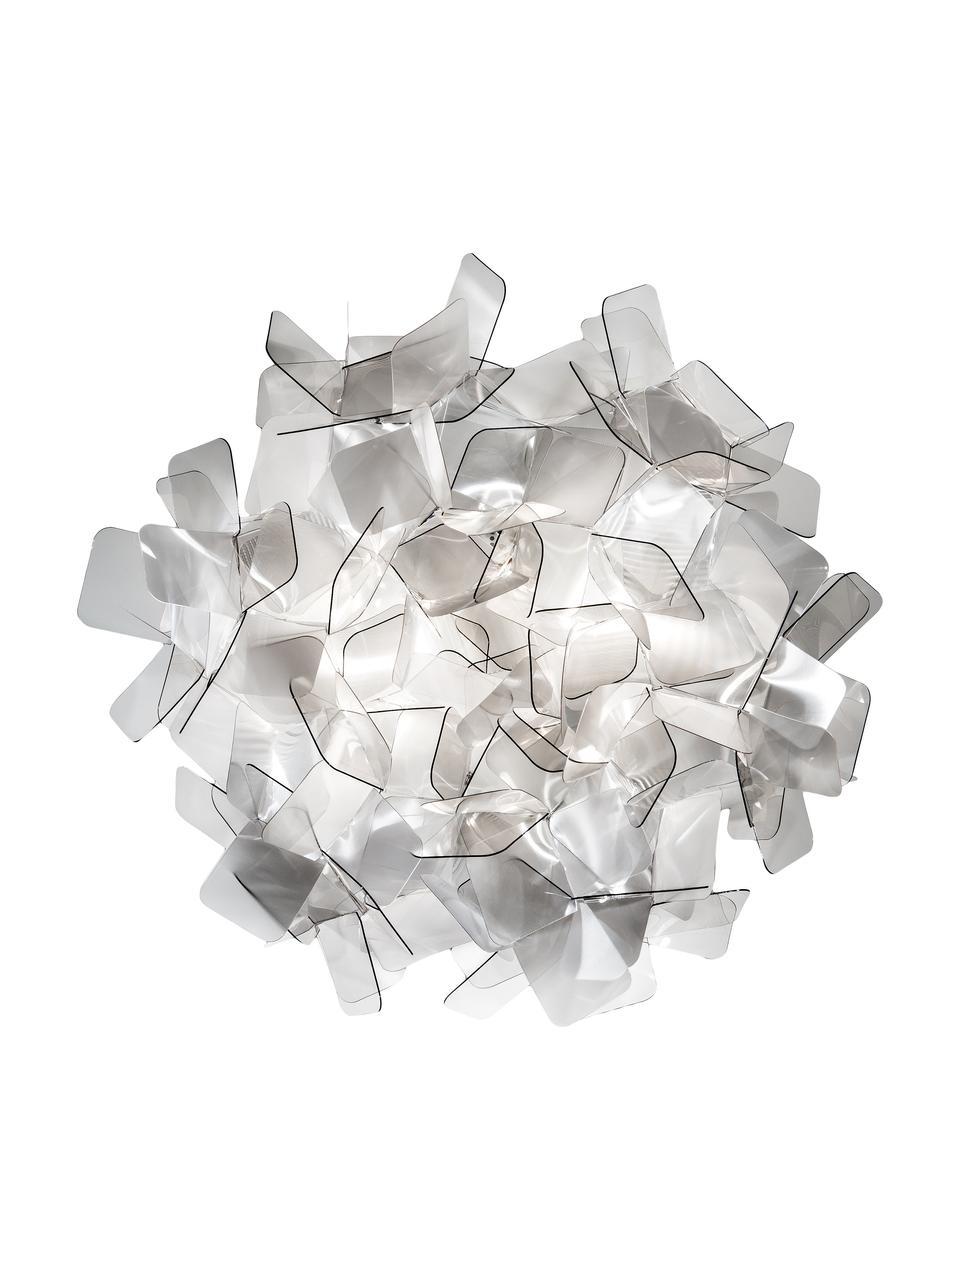 Design plafondlamp Clizia van kunststof, Lampenkap: Technopolymer Lentiflex®,, Lichtgrijs, transparant, Ø 53 x H 20 cm